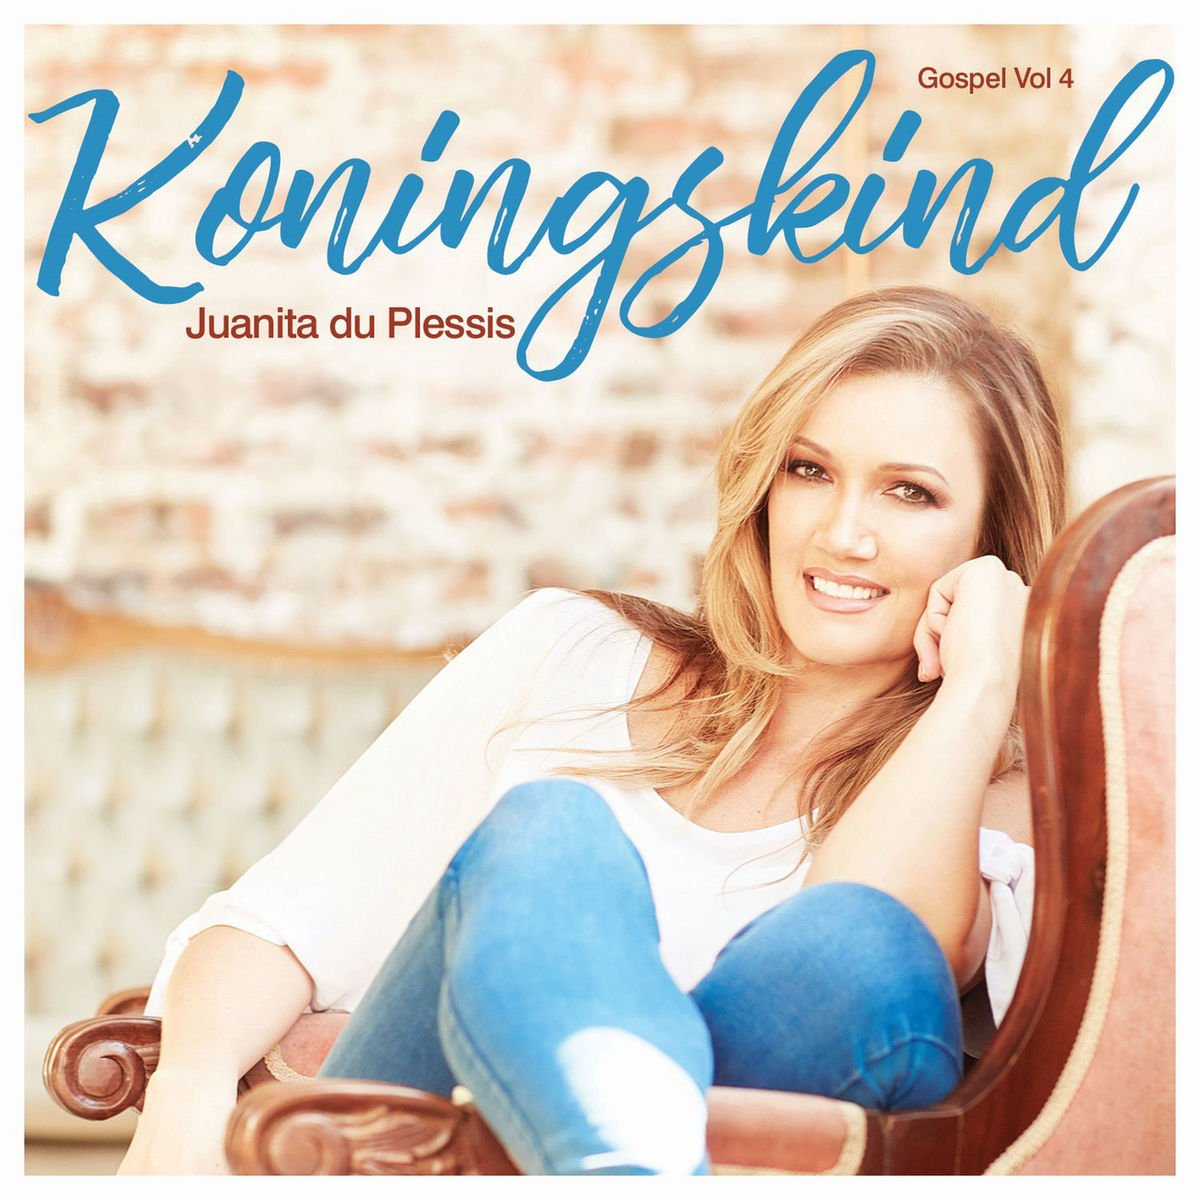 Top 10 - At No. 3 this week Juanita Du Plessis - Koningskind (Gospel, Vol. 4) [CD]  https:// echosrecordbar.co.za/product/94084  &nbsp;   #Top10 #inStock<br>http://pic.twitter.com/HBVEbUGhvm